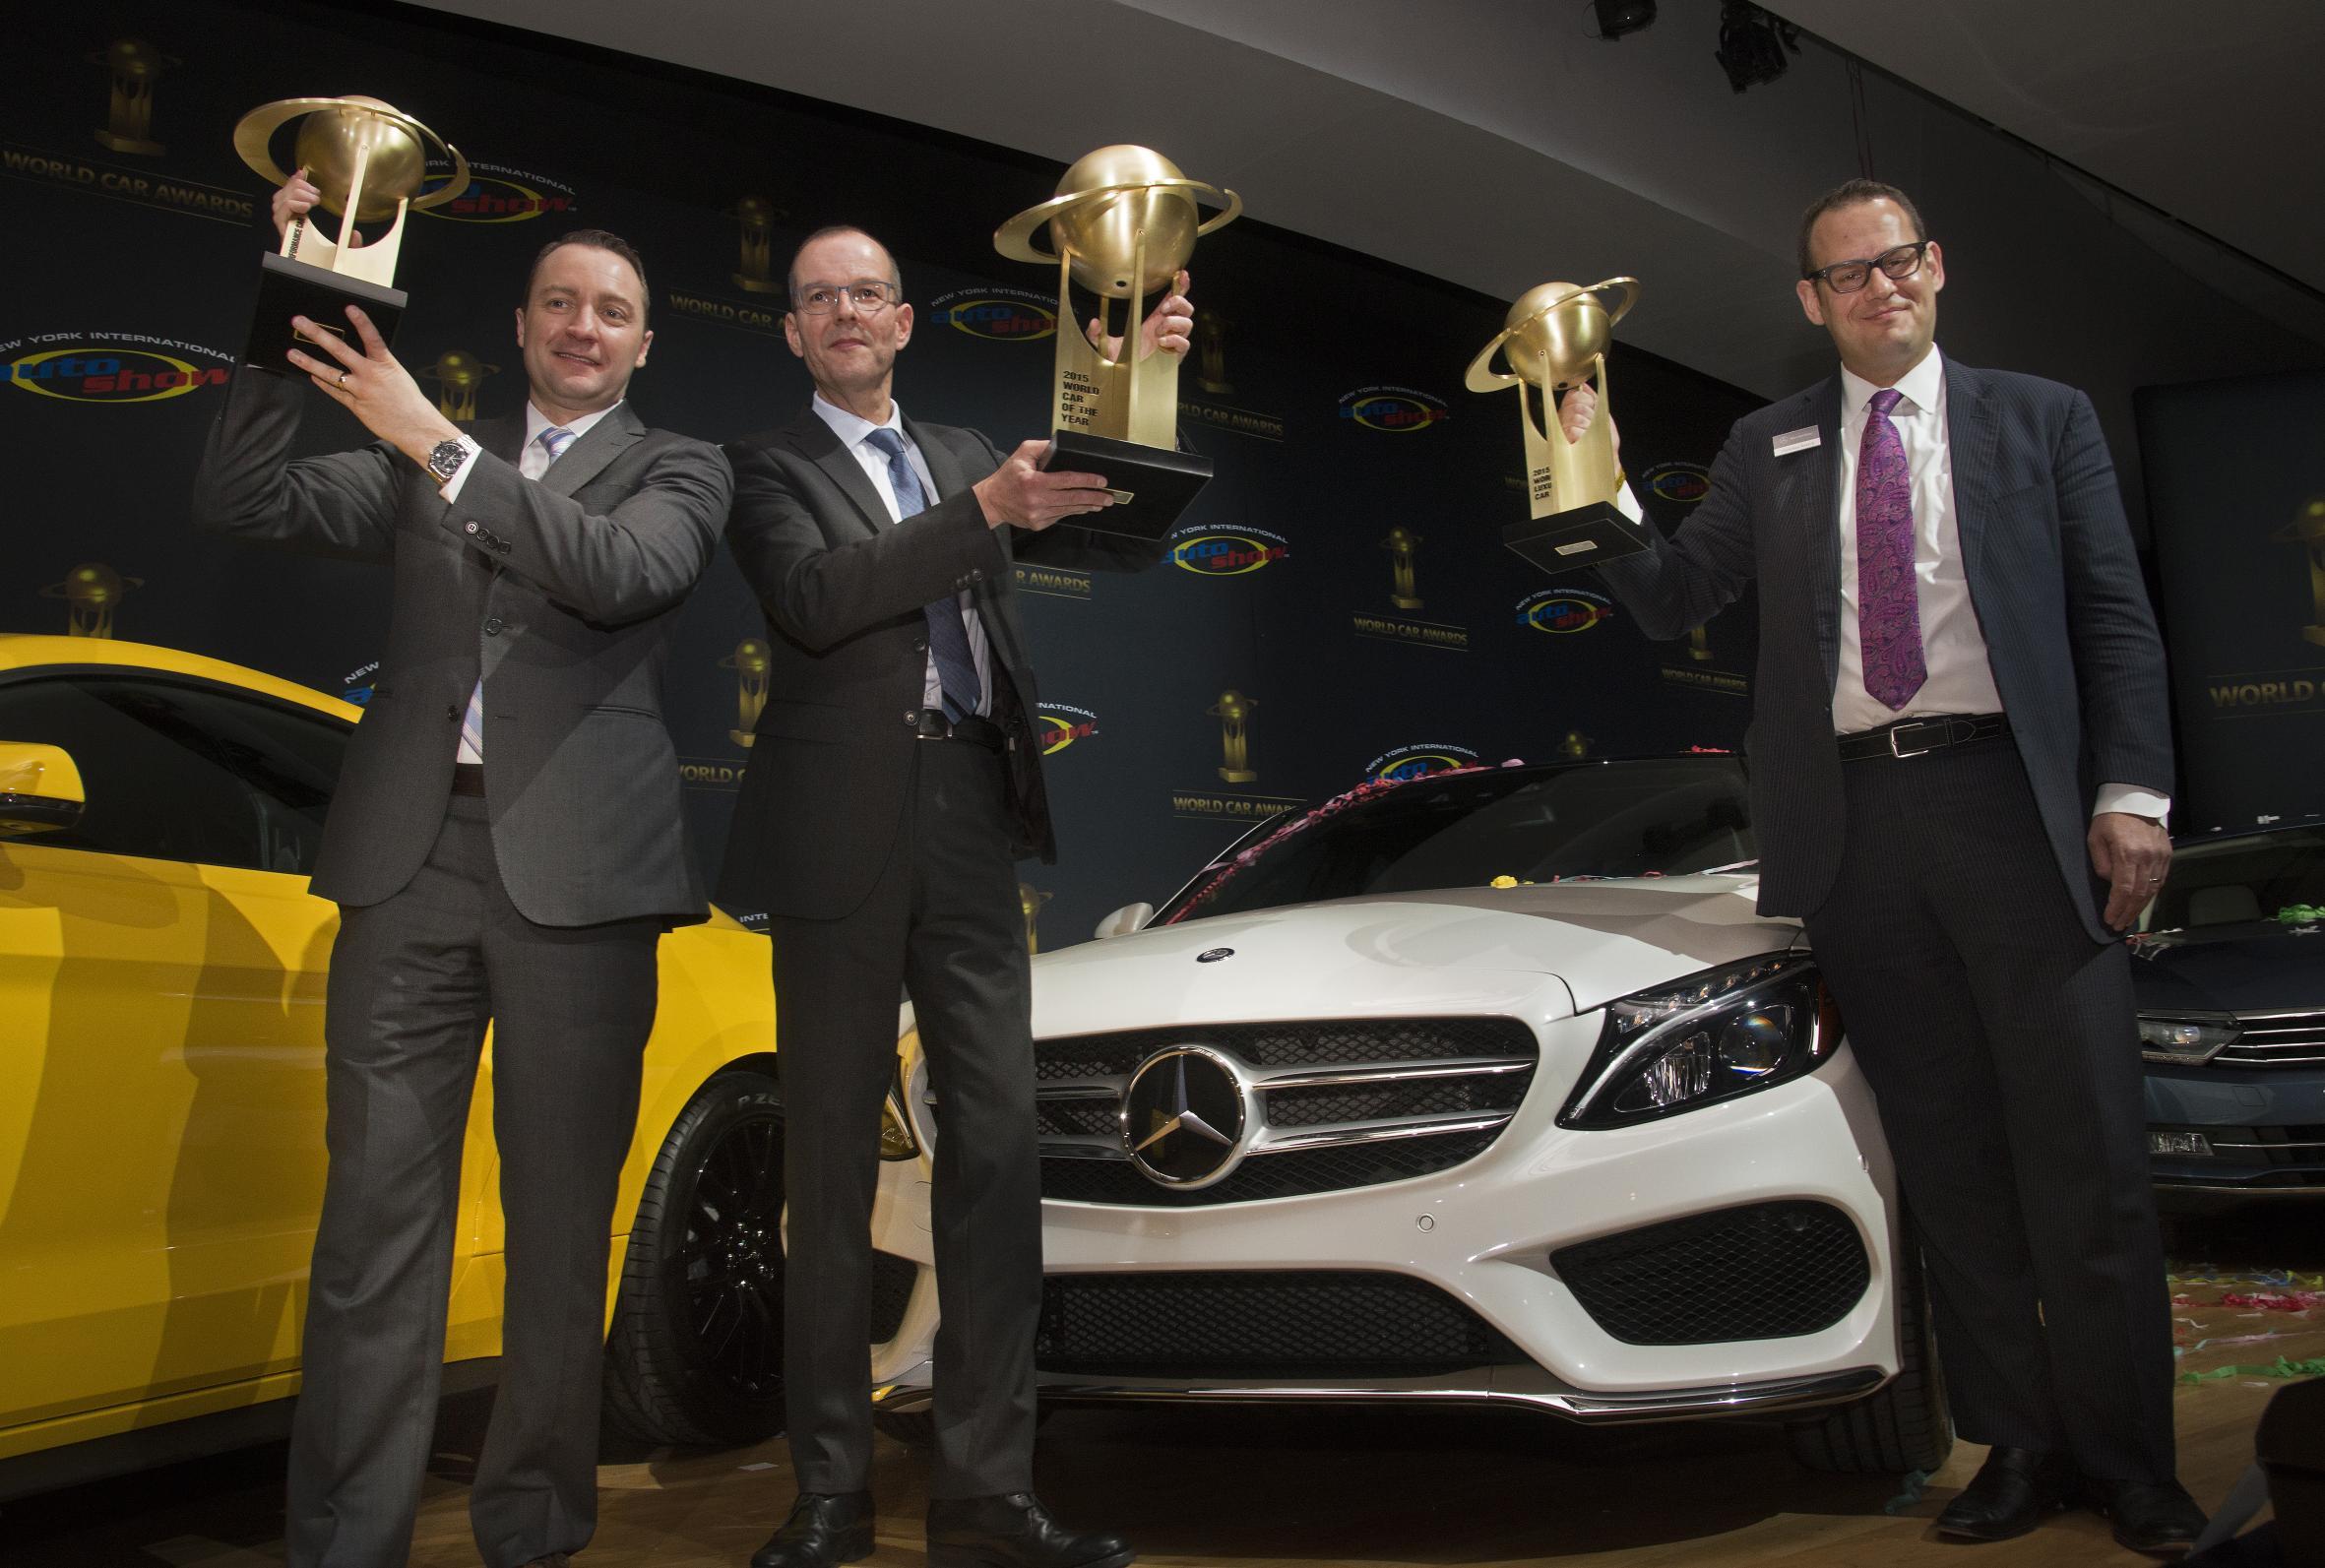 Mercedes Benz Dominates U0027World Car Of The Yearu0027 Awards